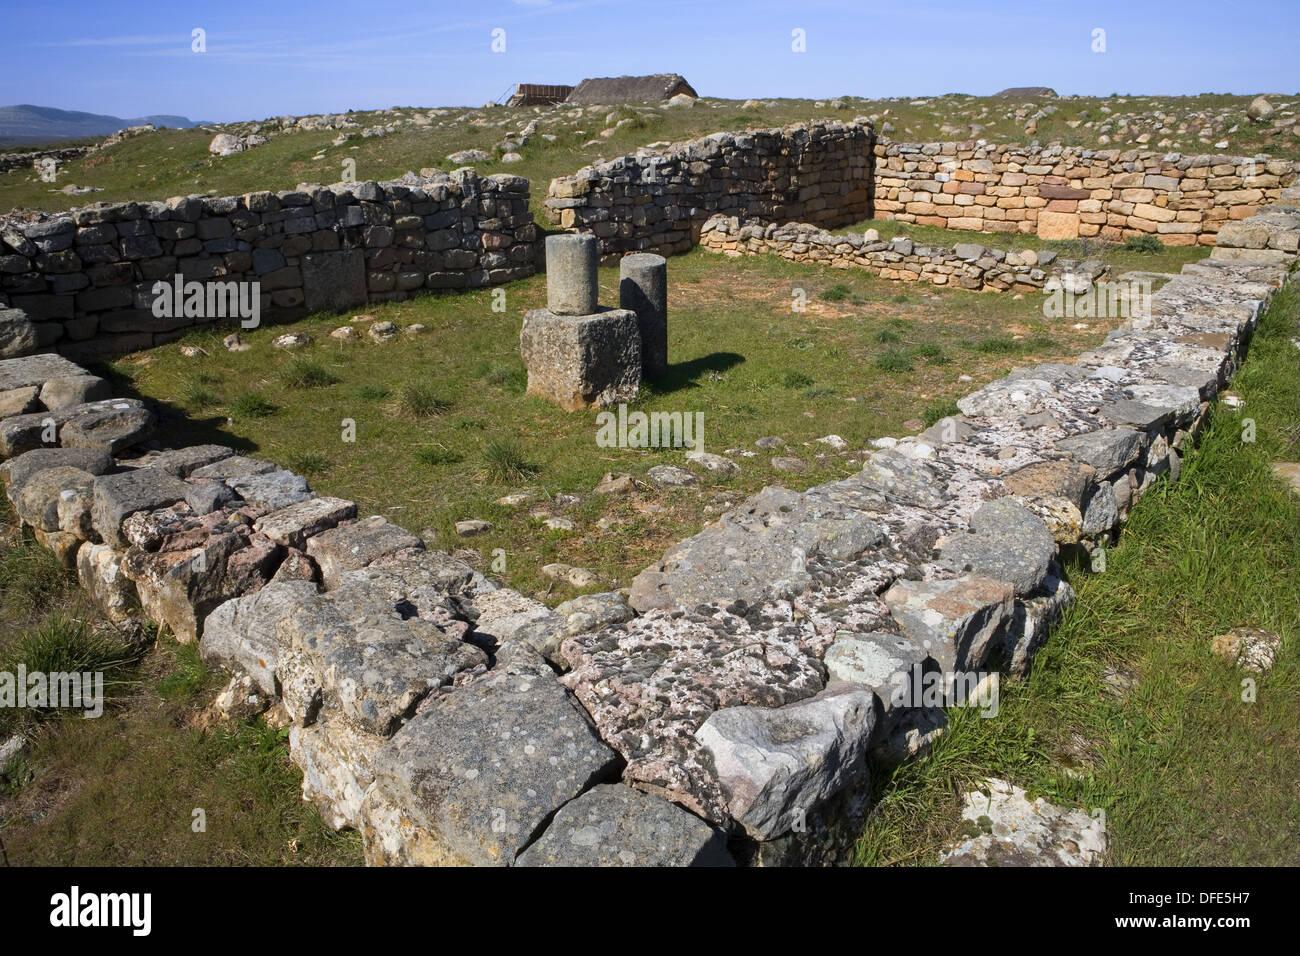 Ancient city of Celtiberians and Arevacos. Numancia. Soria province. Castilla y León. Spain. - Stock Image